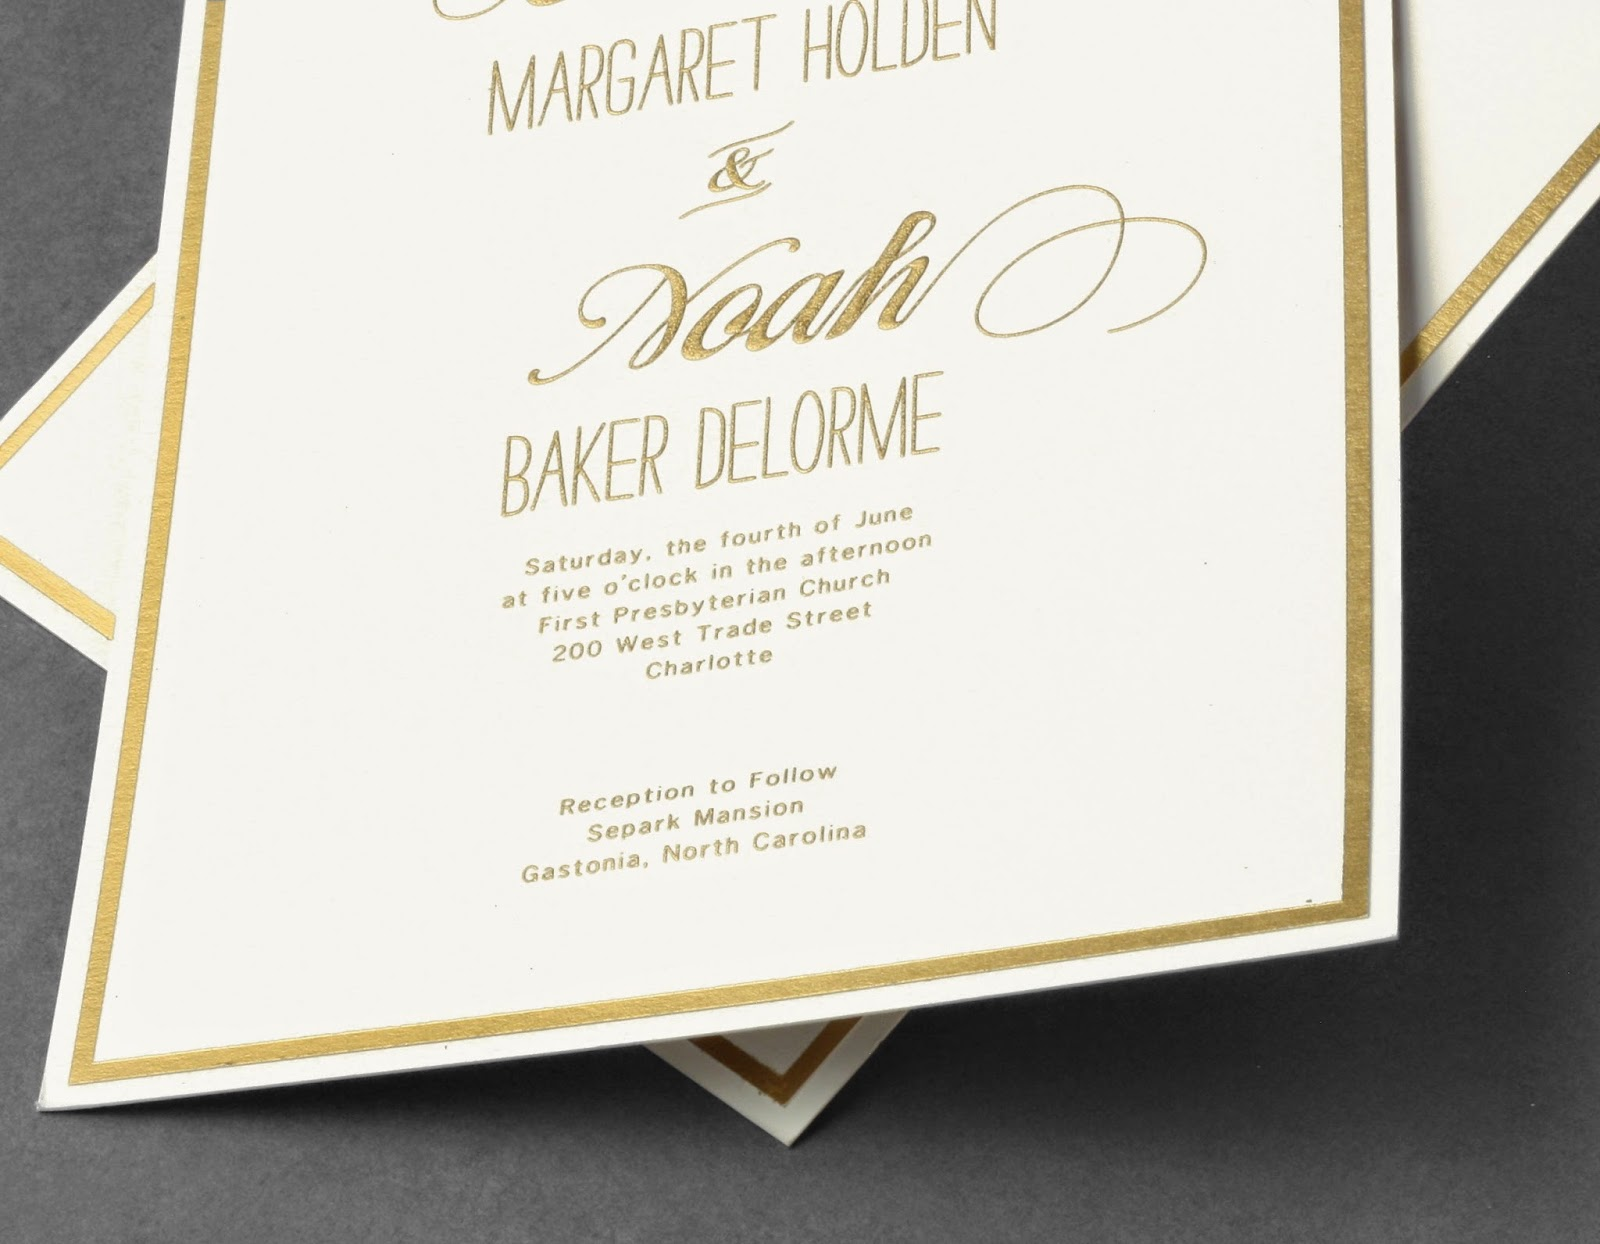 Wedding Invitations William Arthur: William Arthur Blog: Our New Vera Wang Wedding Album: Gold